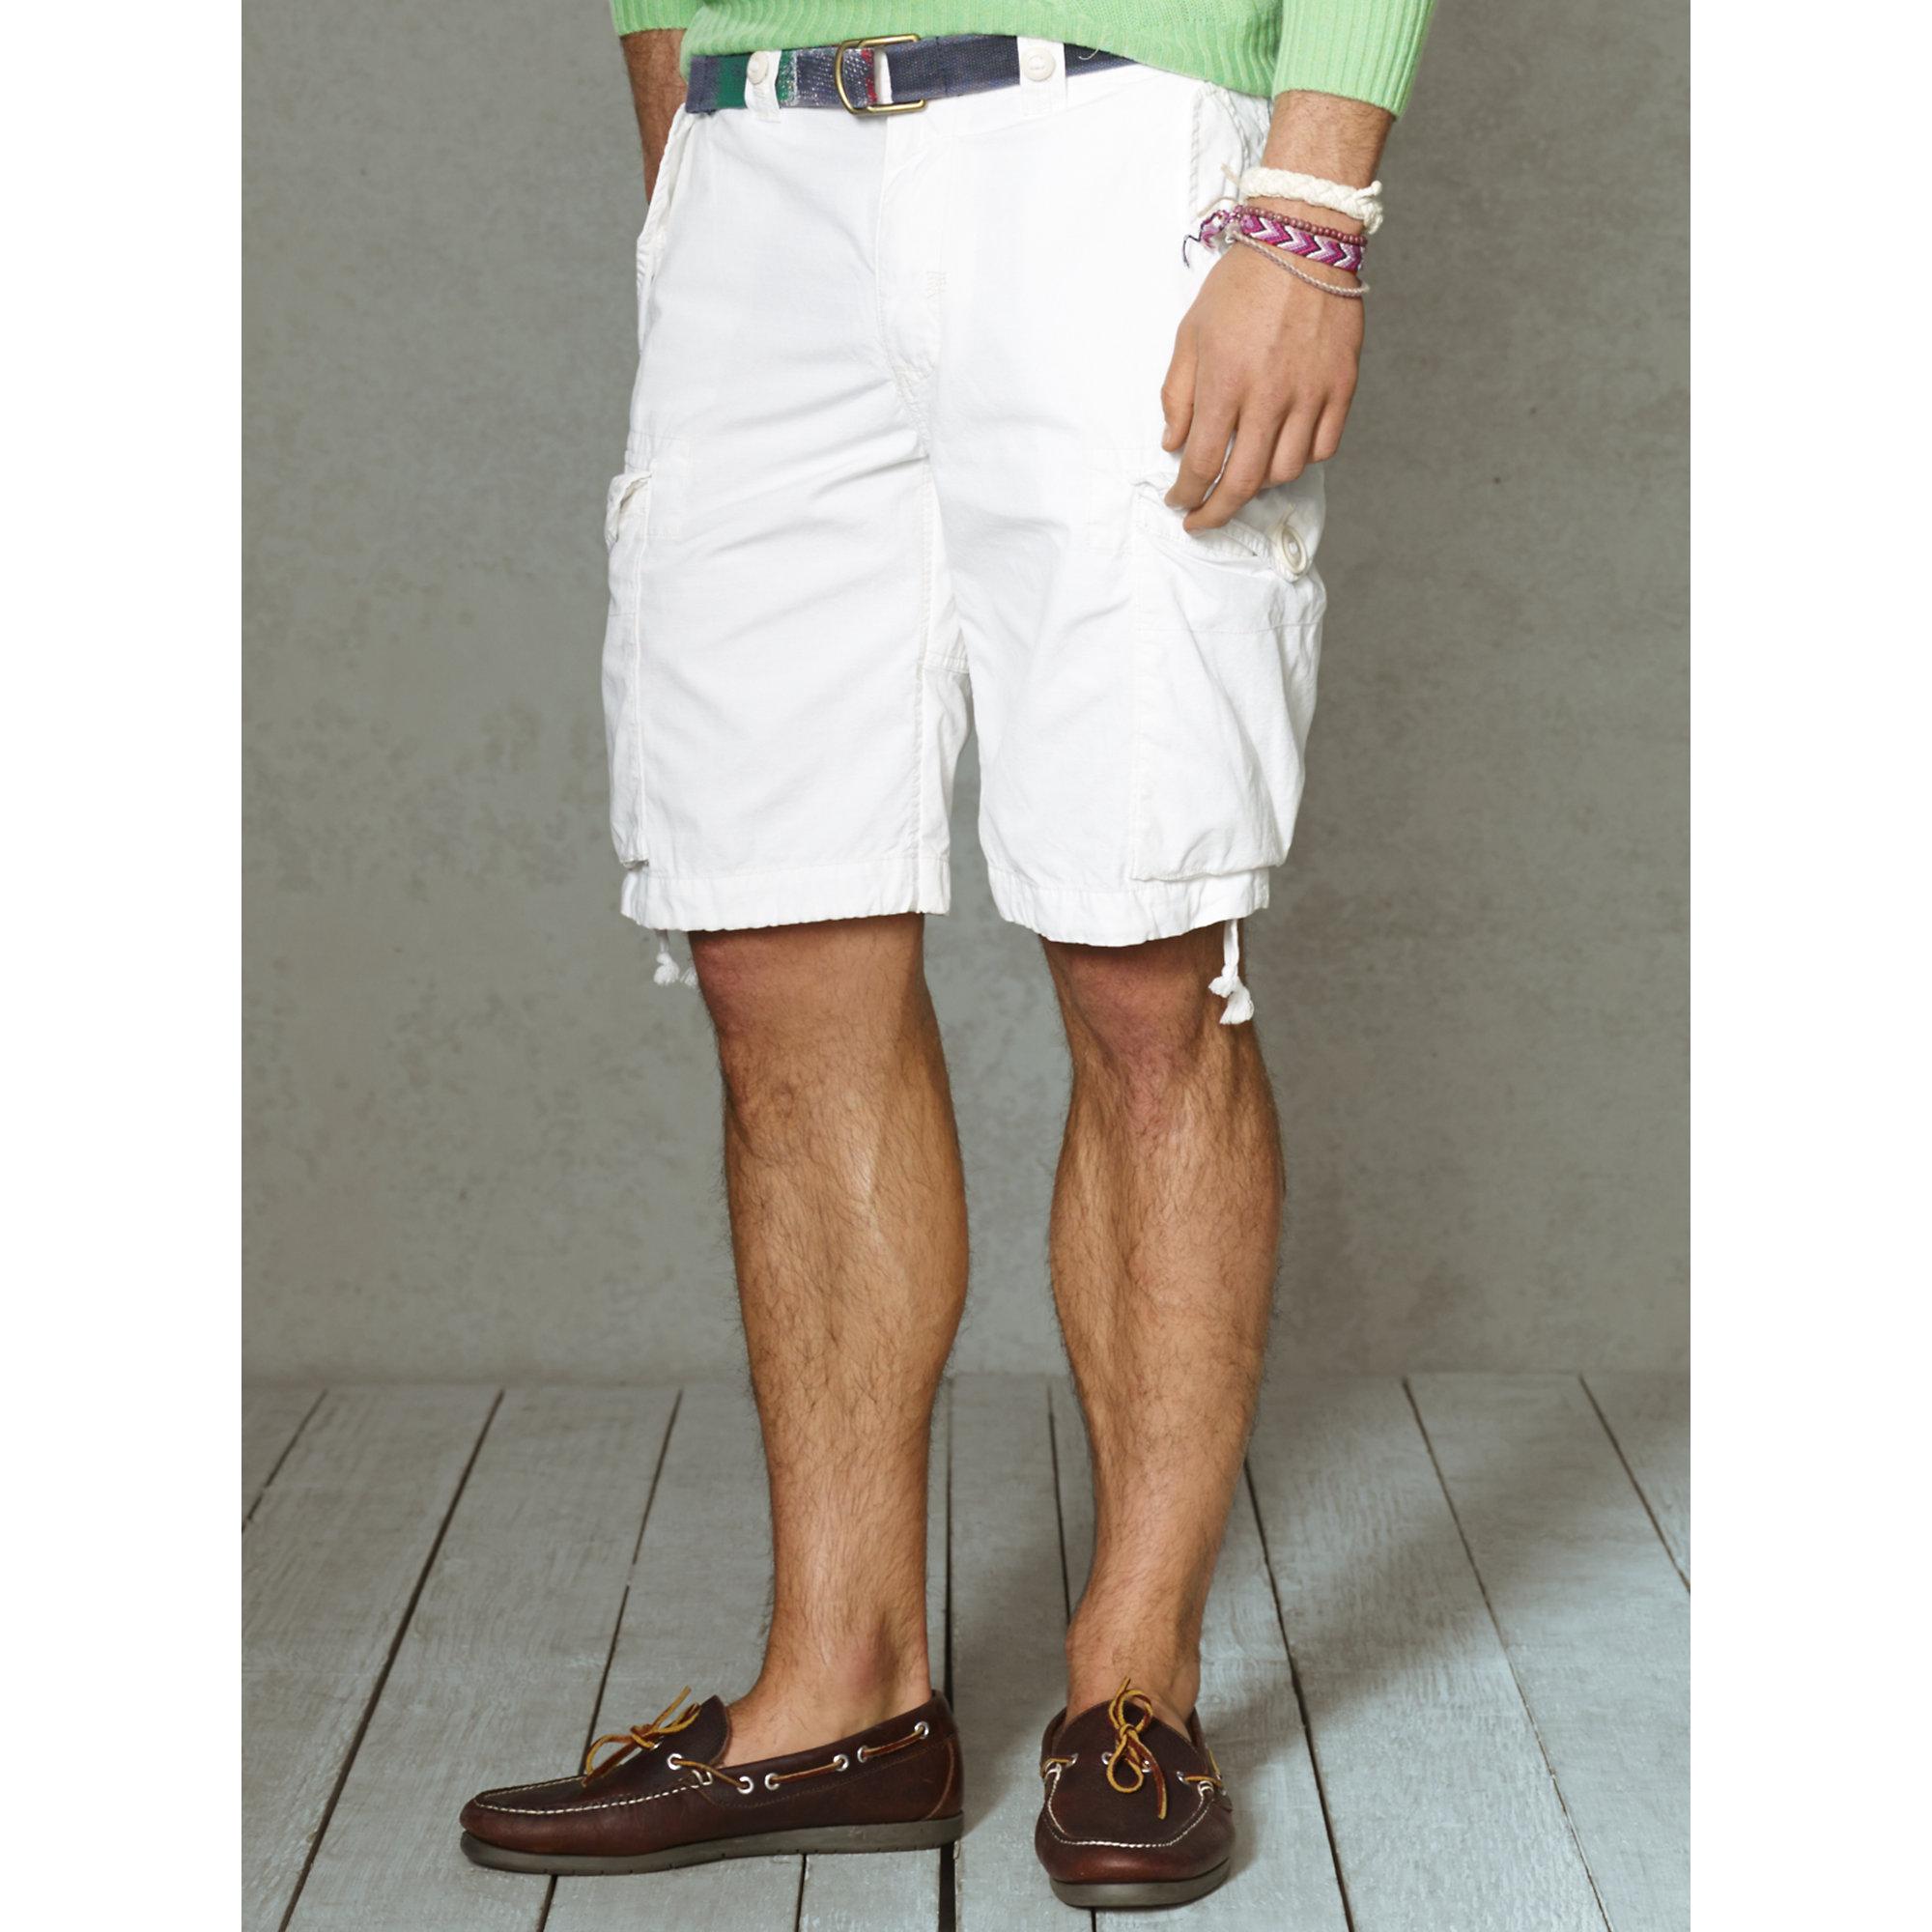 8696c1d88 Polo Ralph Lauren Classic-Fit Cargo Short in White for Men - Lyst